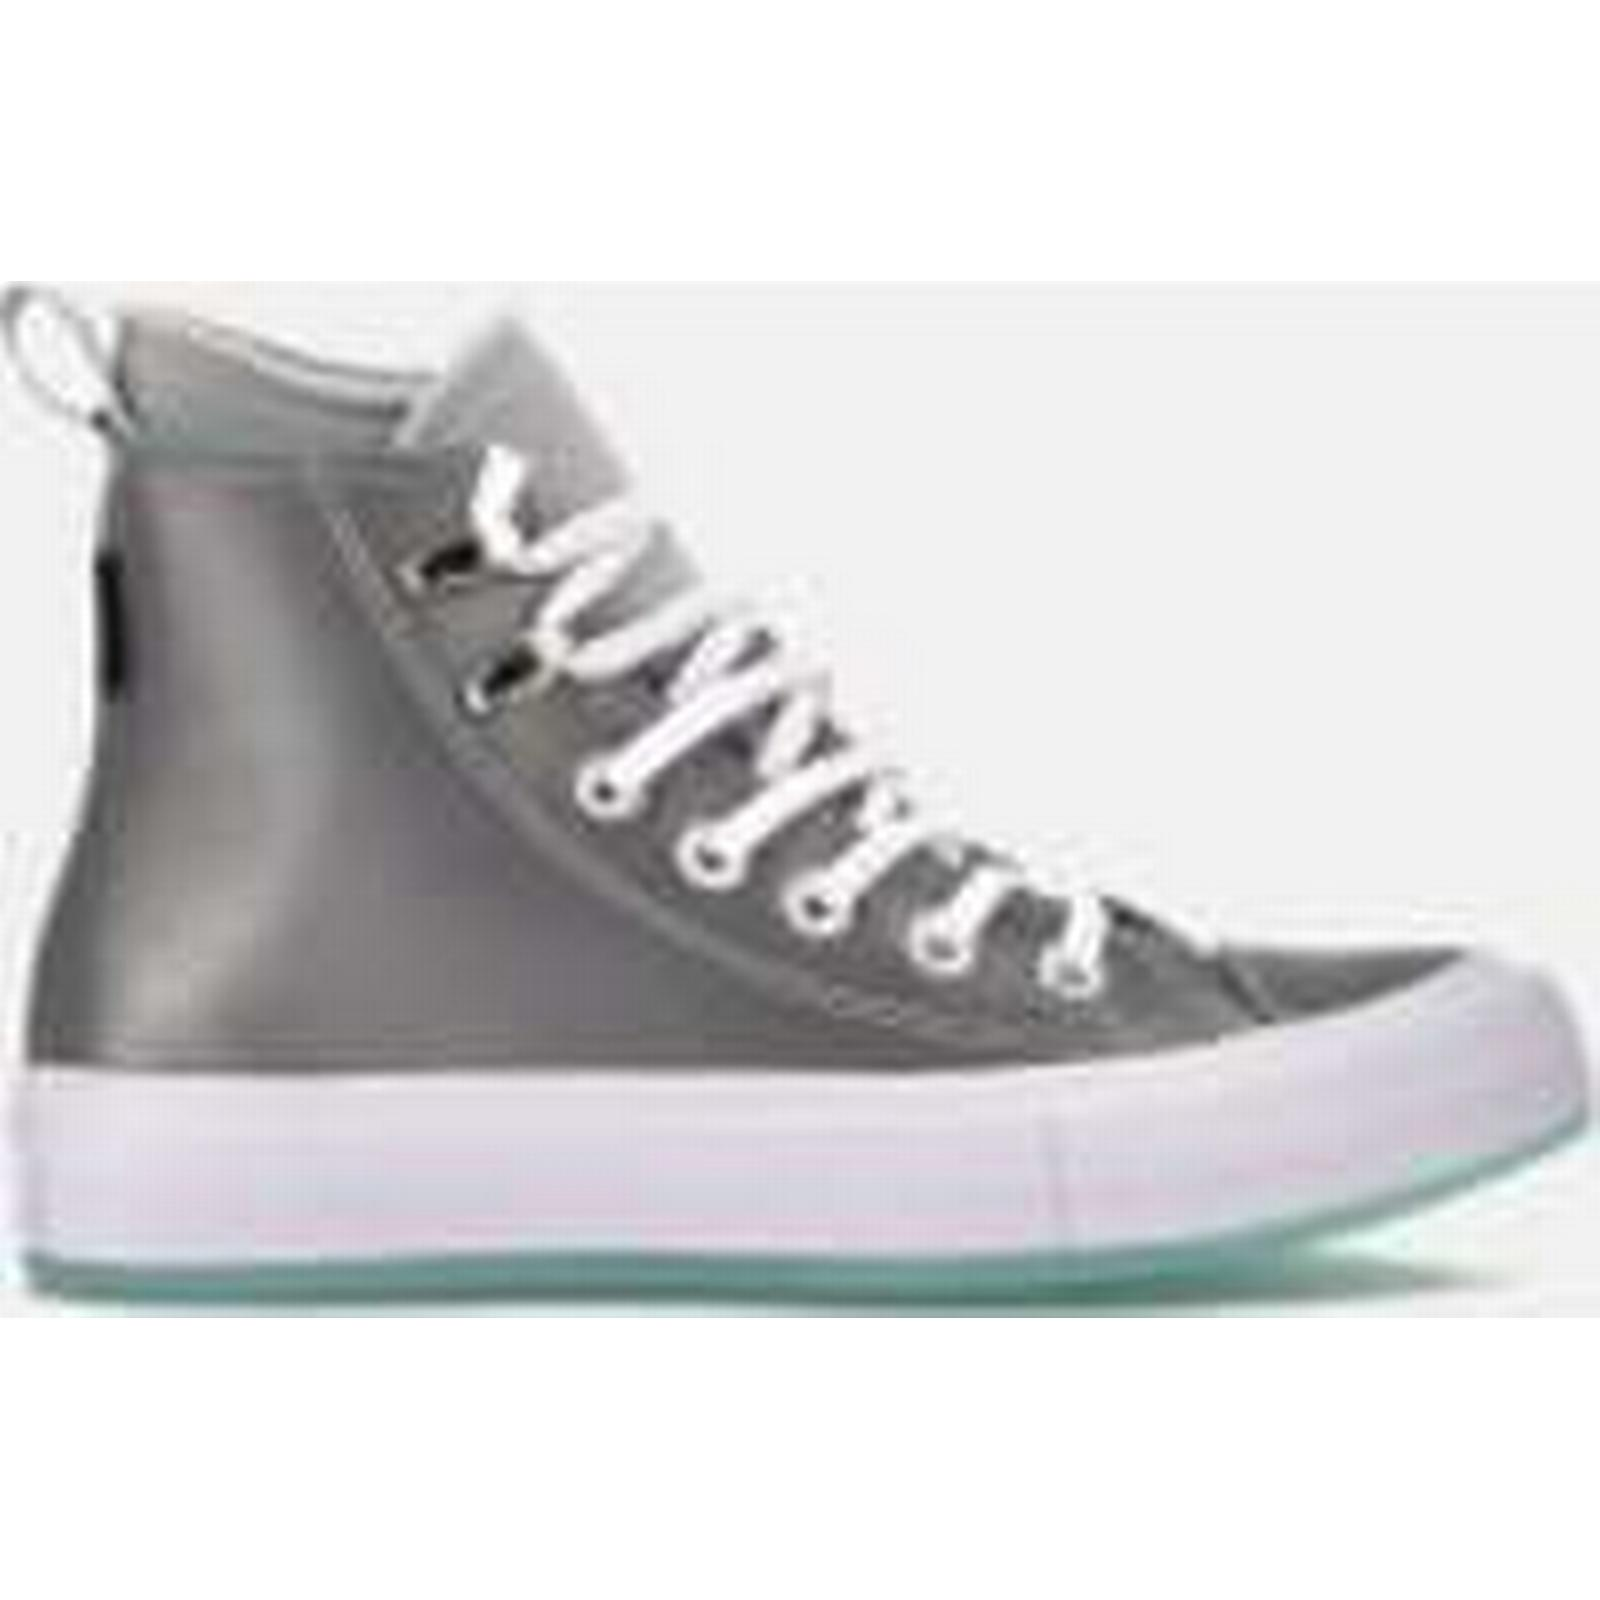 Converse Women's Chuck Taylor - All Star Waterproof Boots - Taylor Pure Platinum/Light Aqua/White - UK 3 - Grey 75db91